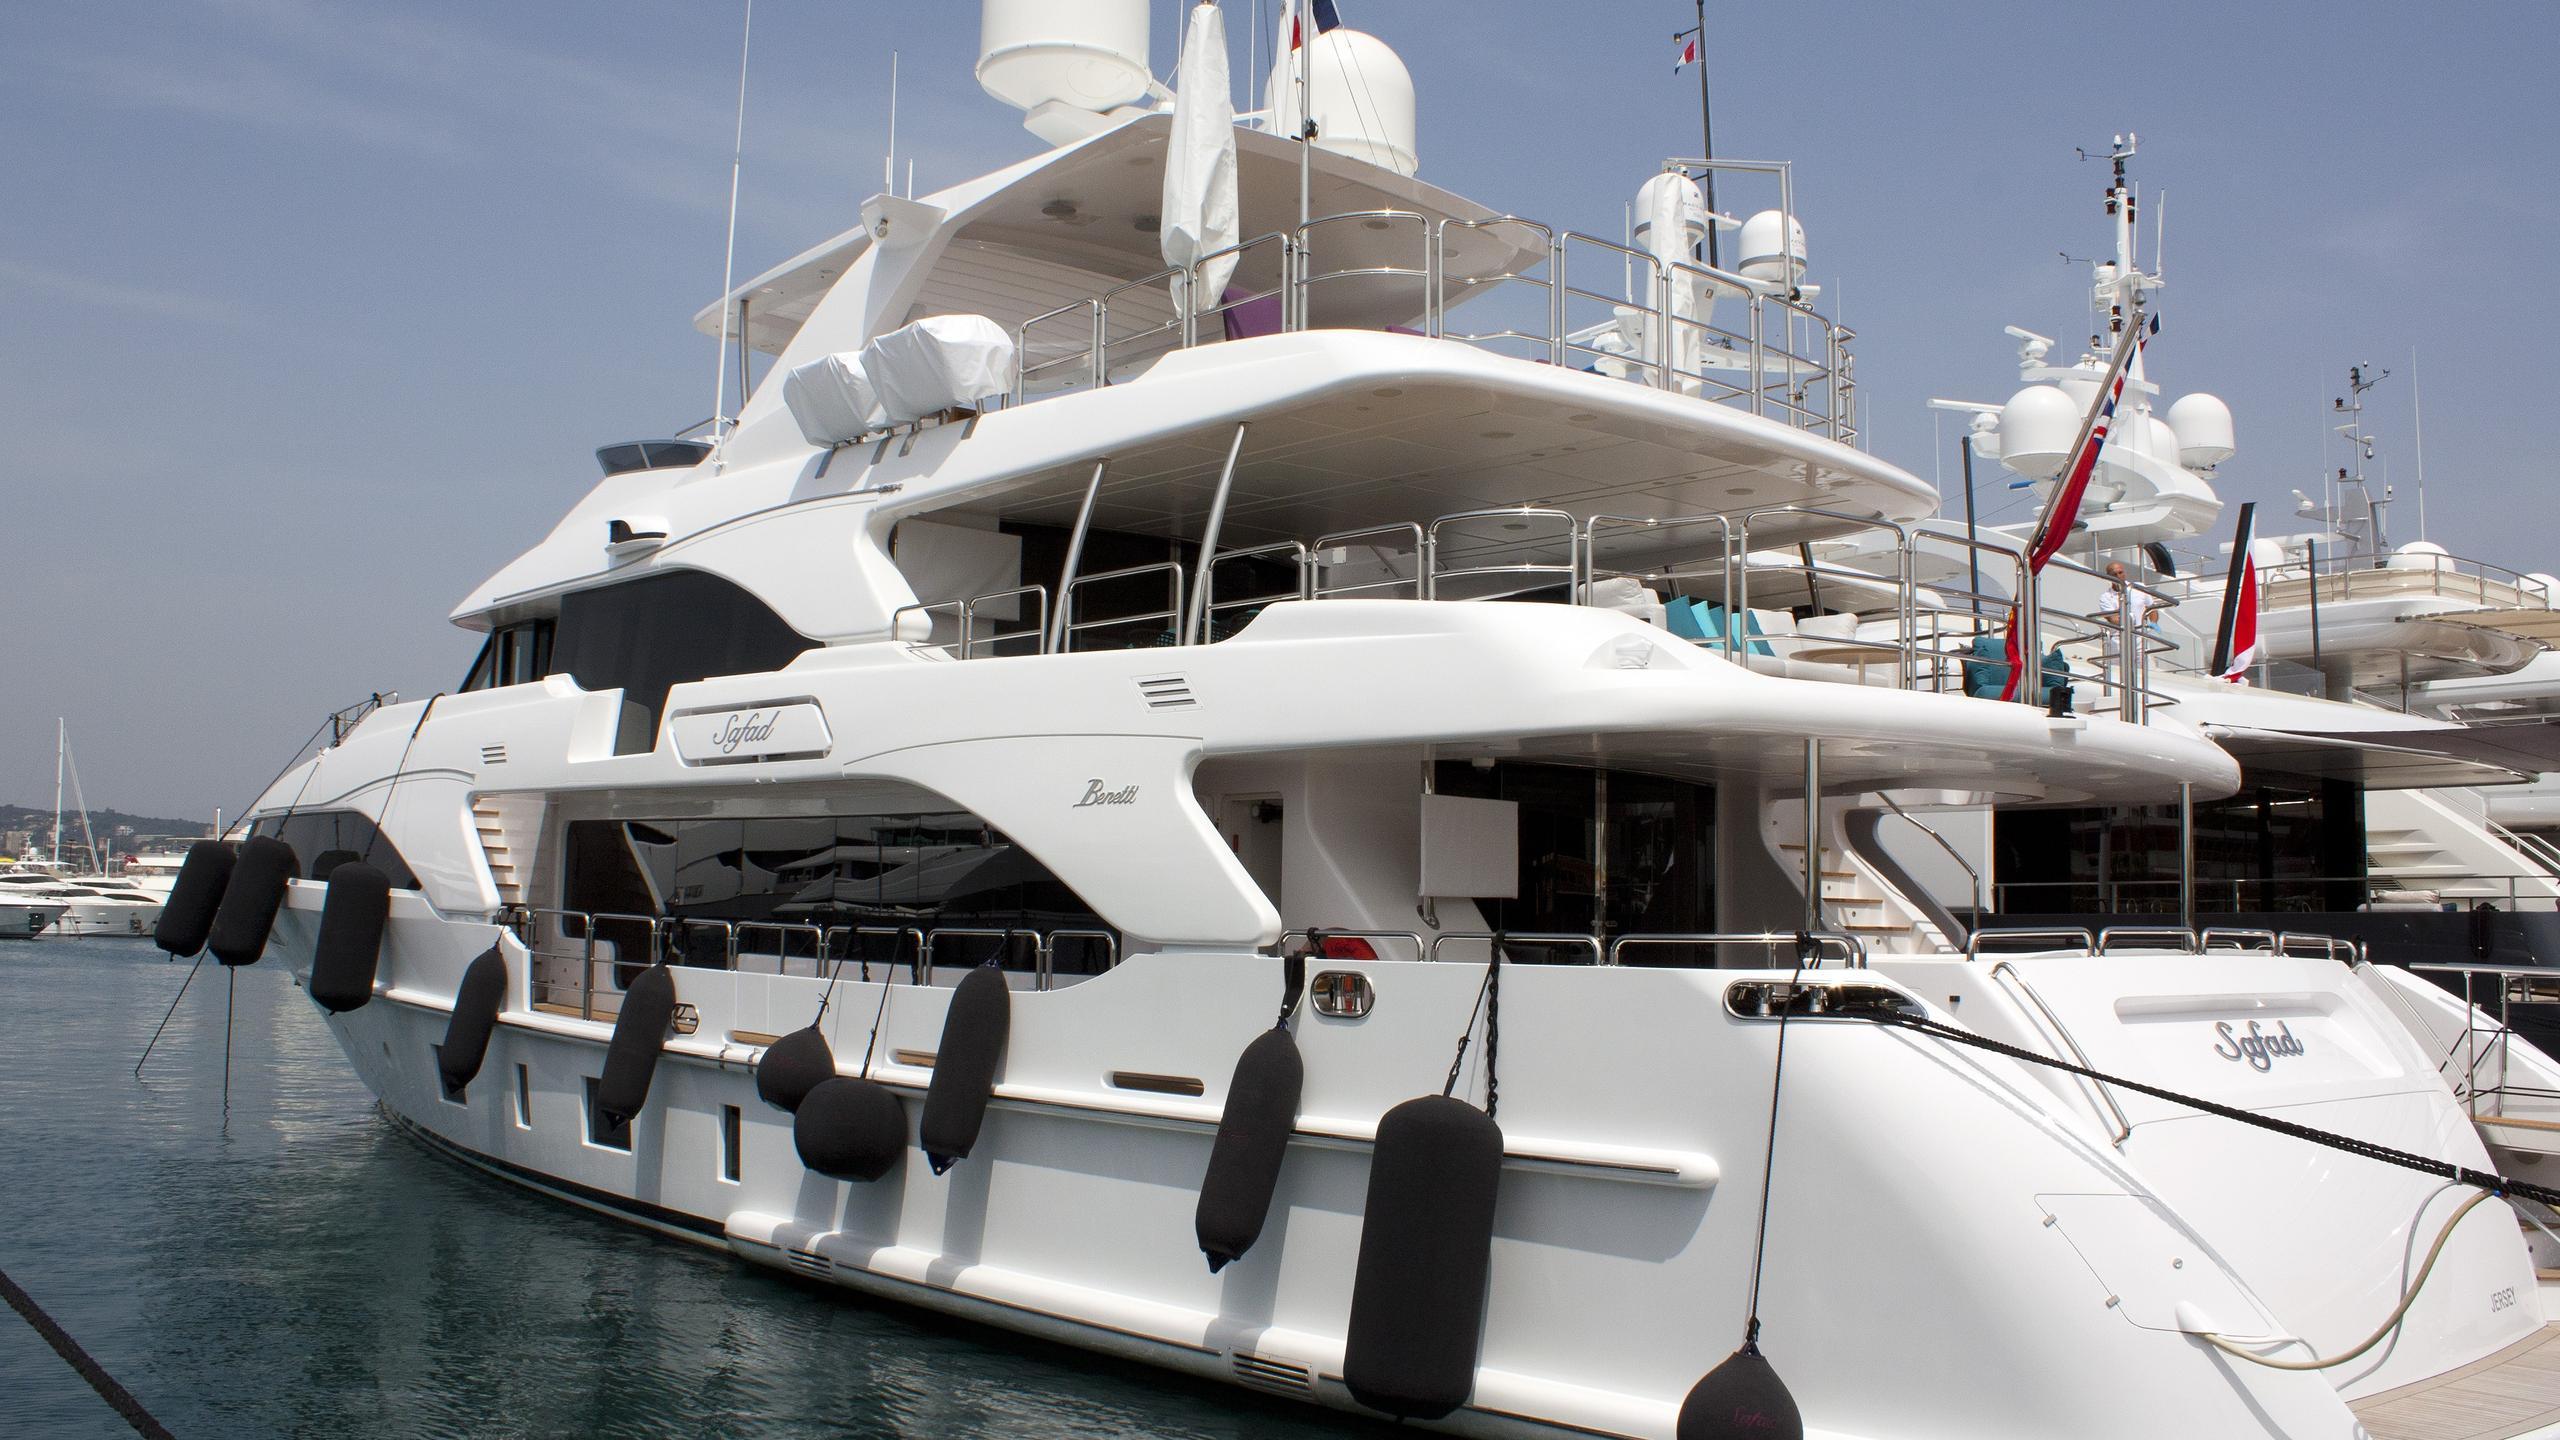 safad motoryacht benetti classic 2015 37m half stern